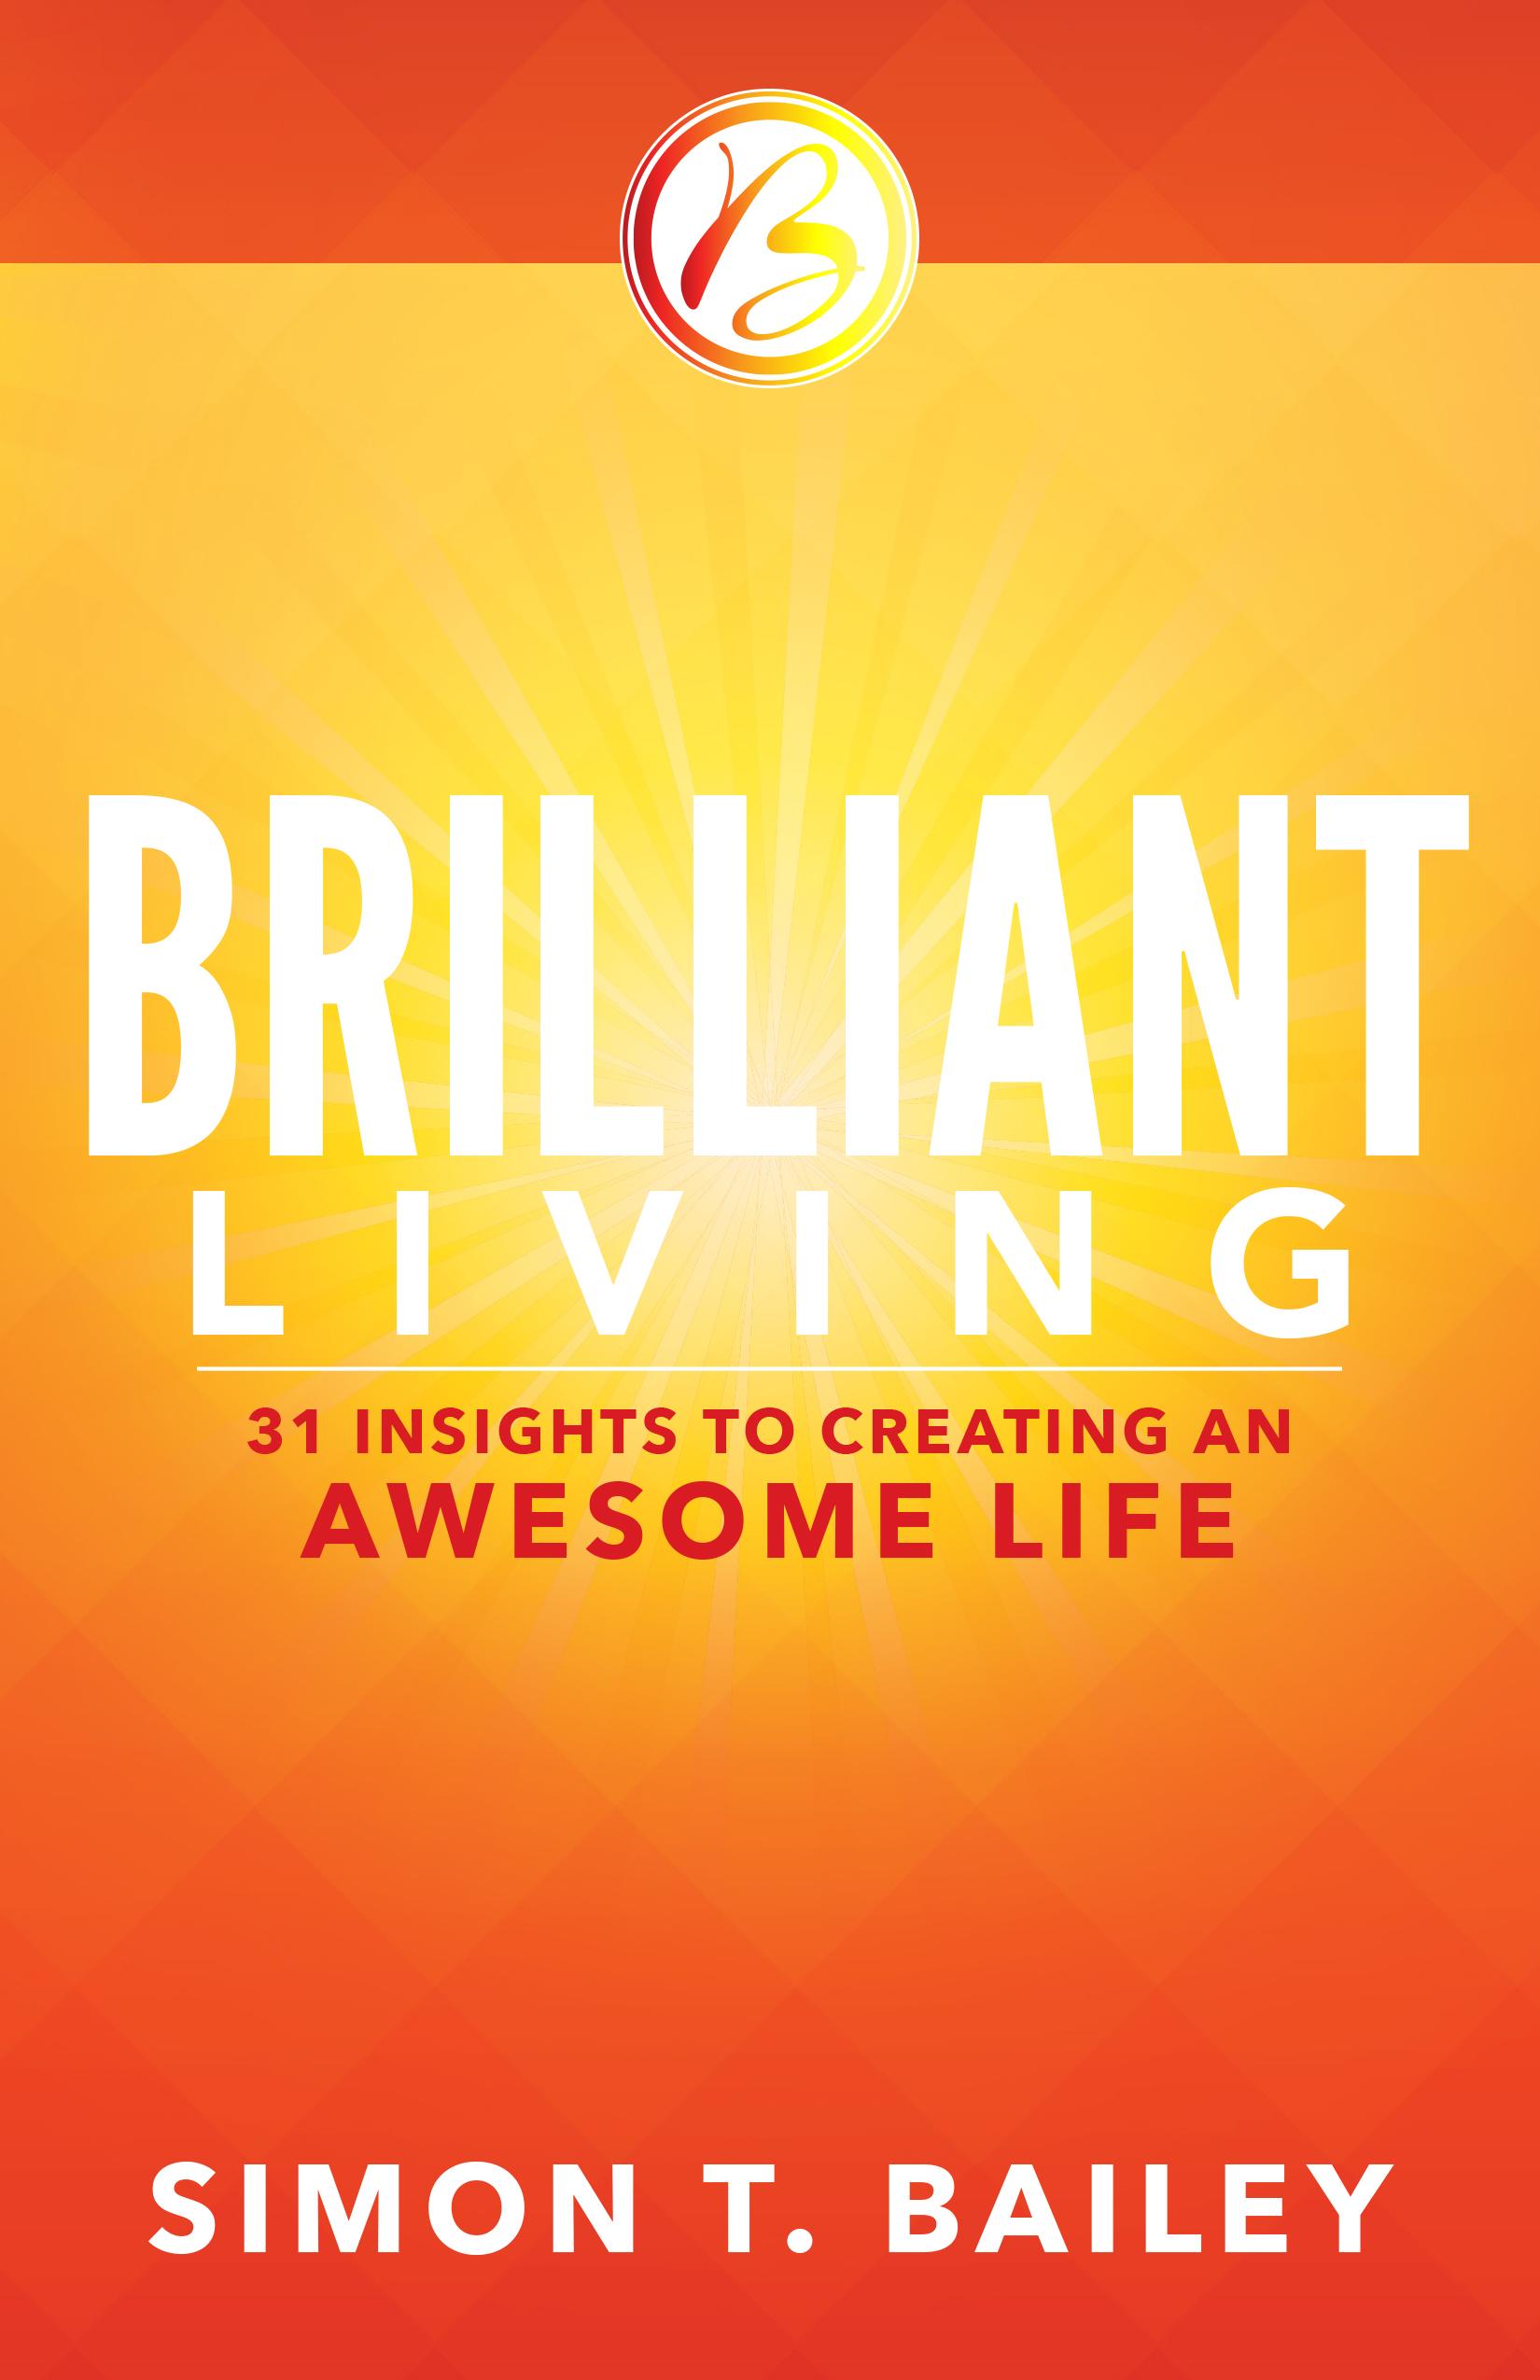 Brilliant Living - By simon t. bailey